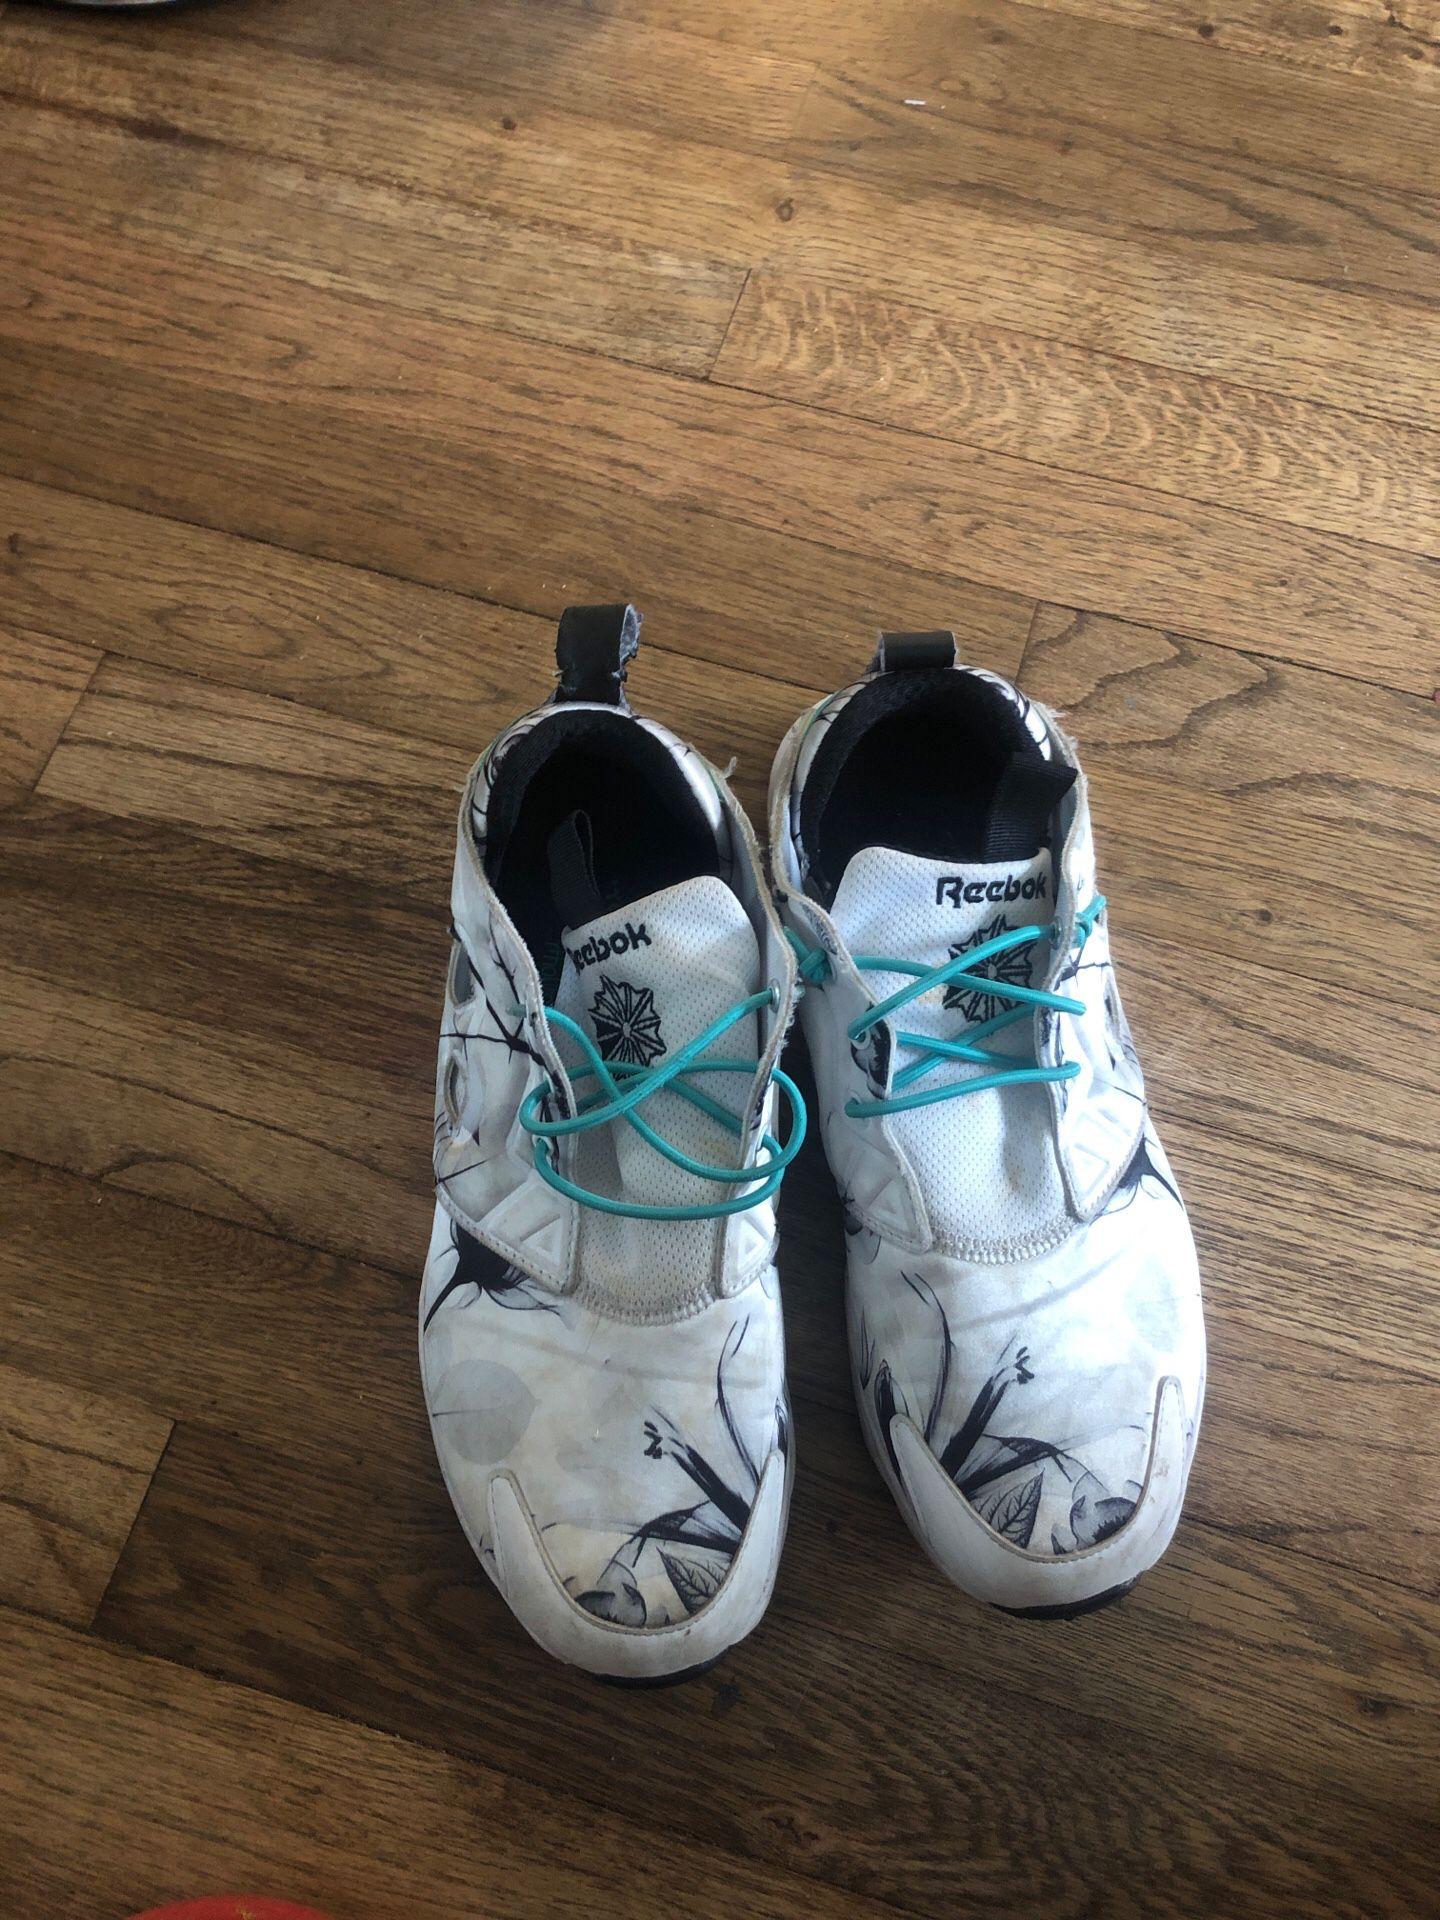 Reebok woman sneakers size 9